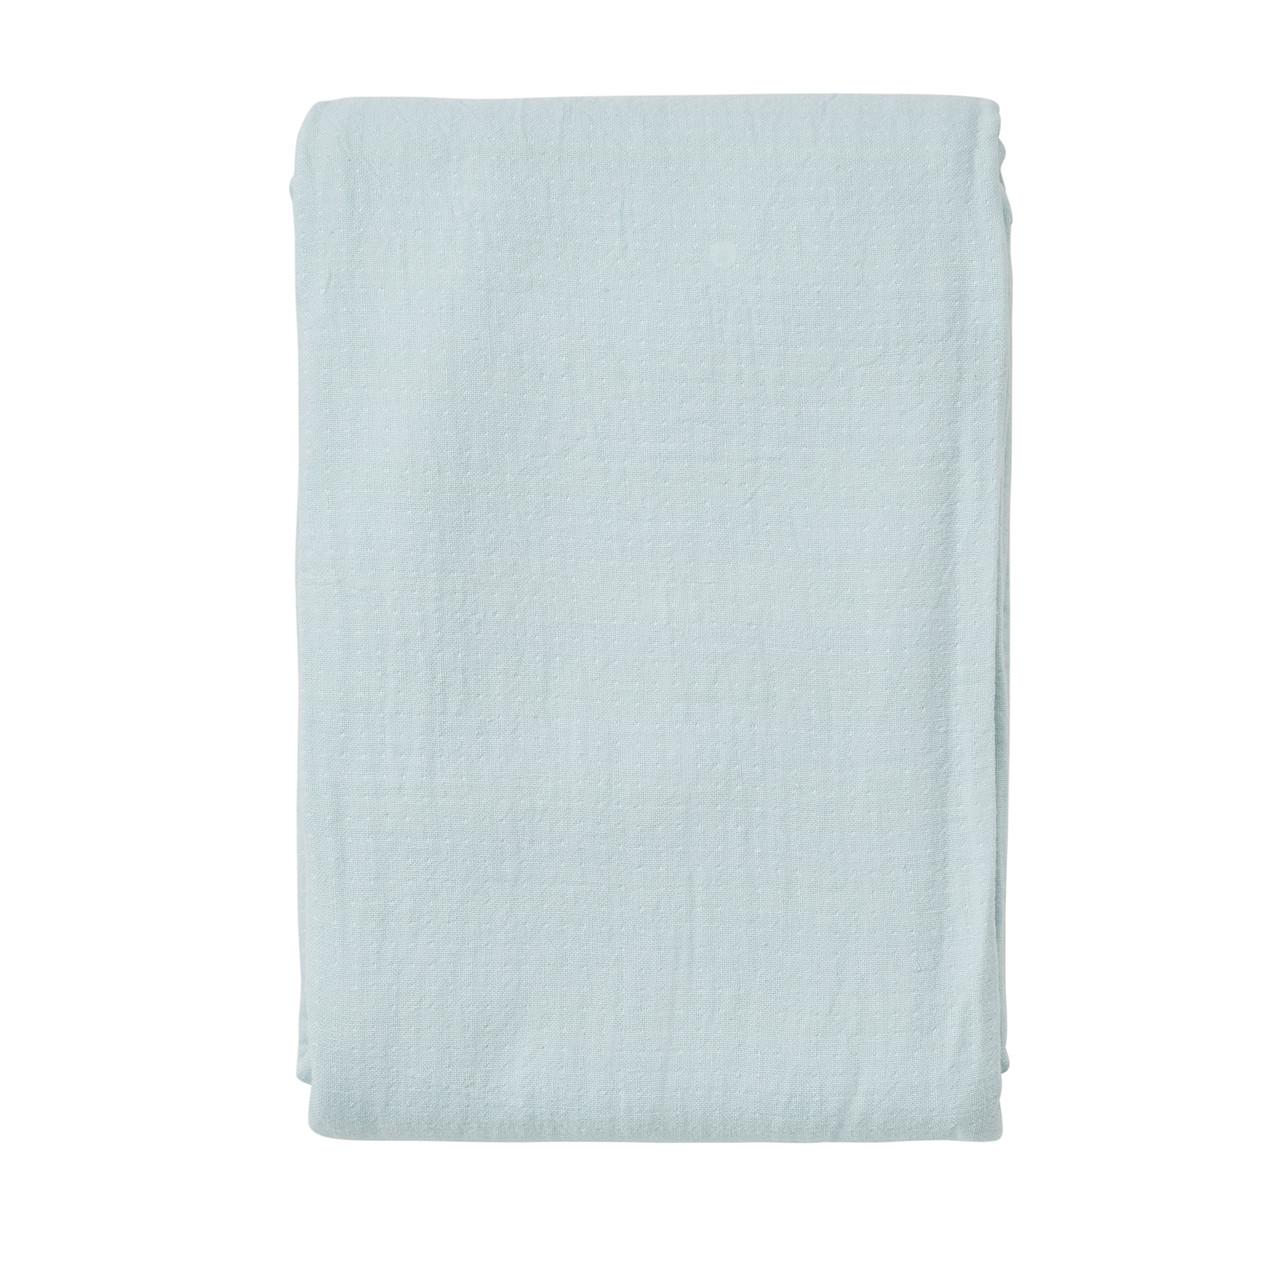 SÖDAHL Point sengetæppe 240x260 cm linen blue